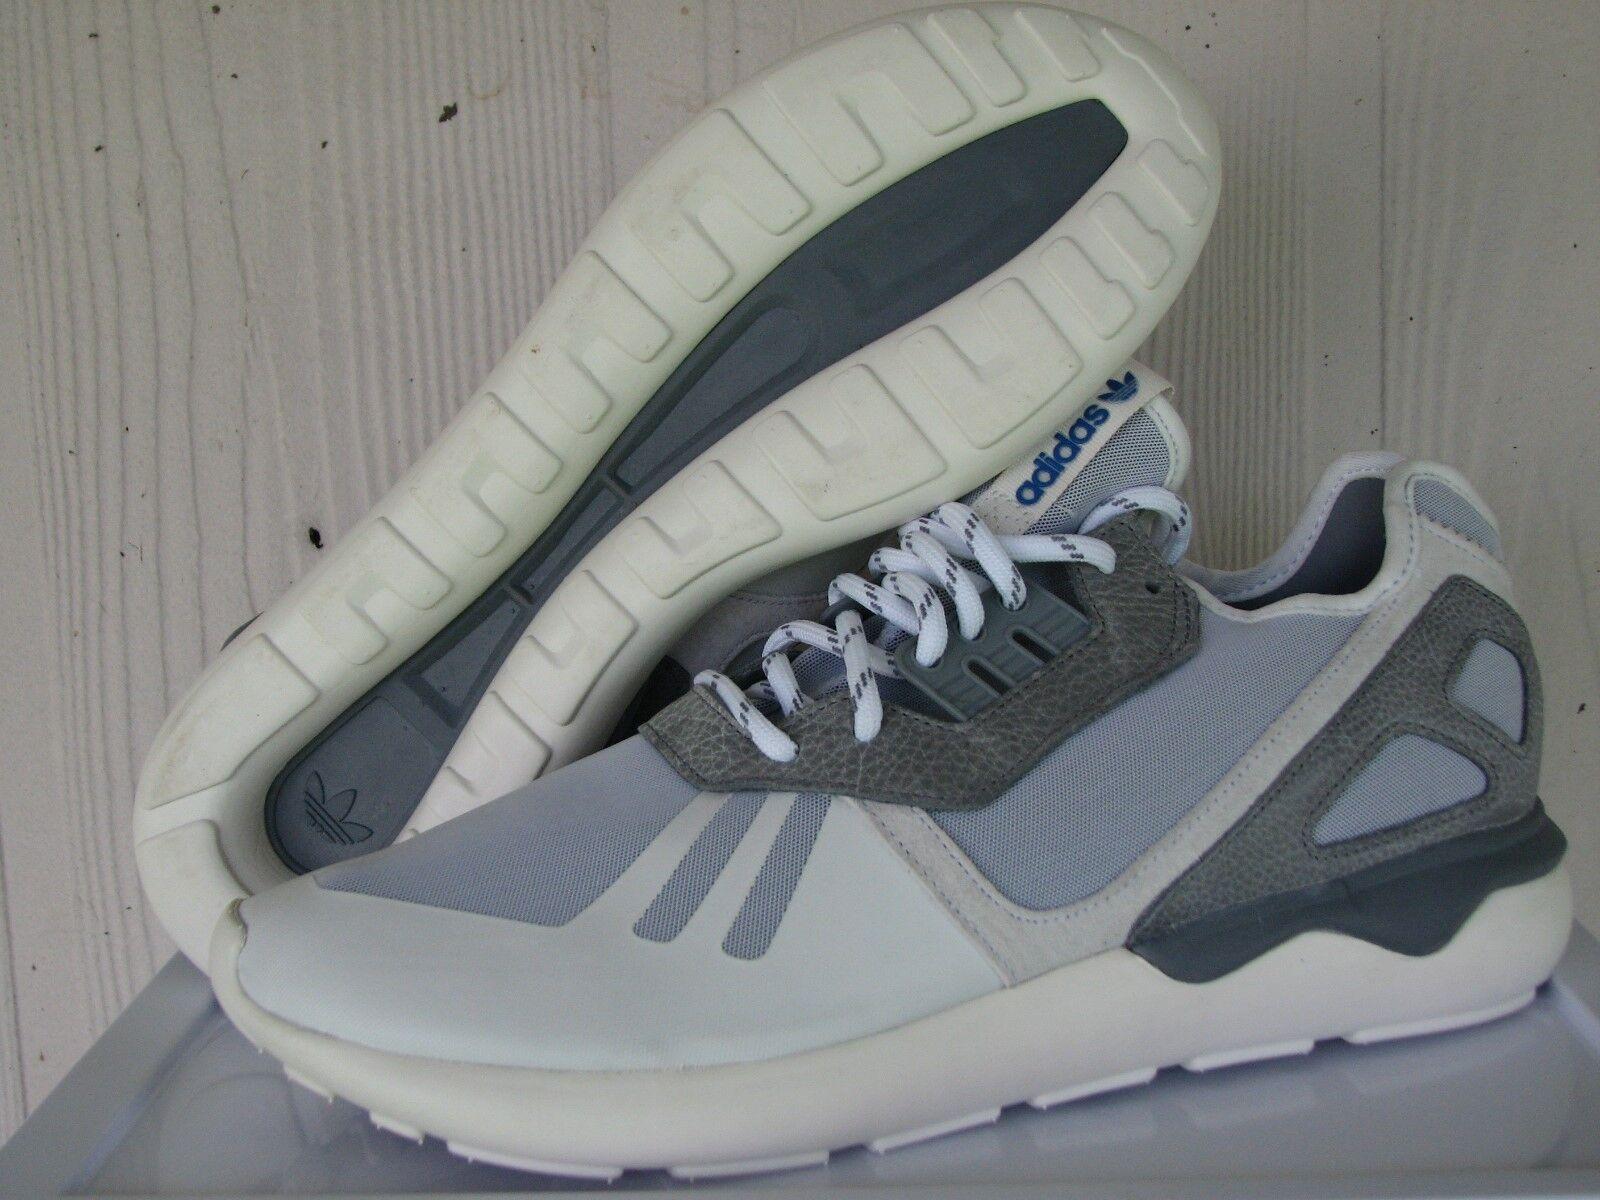 Men's Adidas Originals Tubular White Grey Runner Athletic Casual shoes M19645